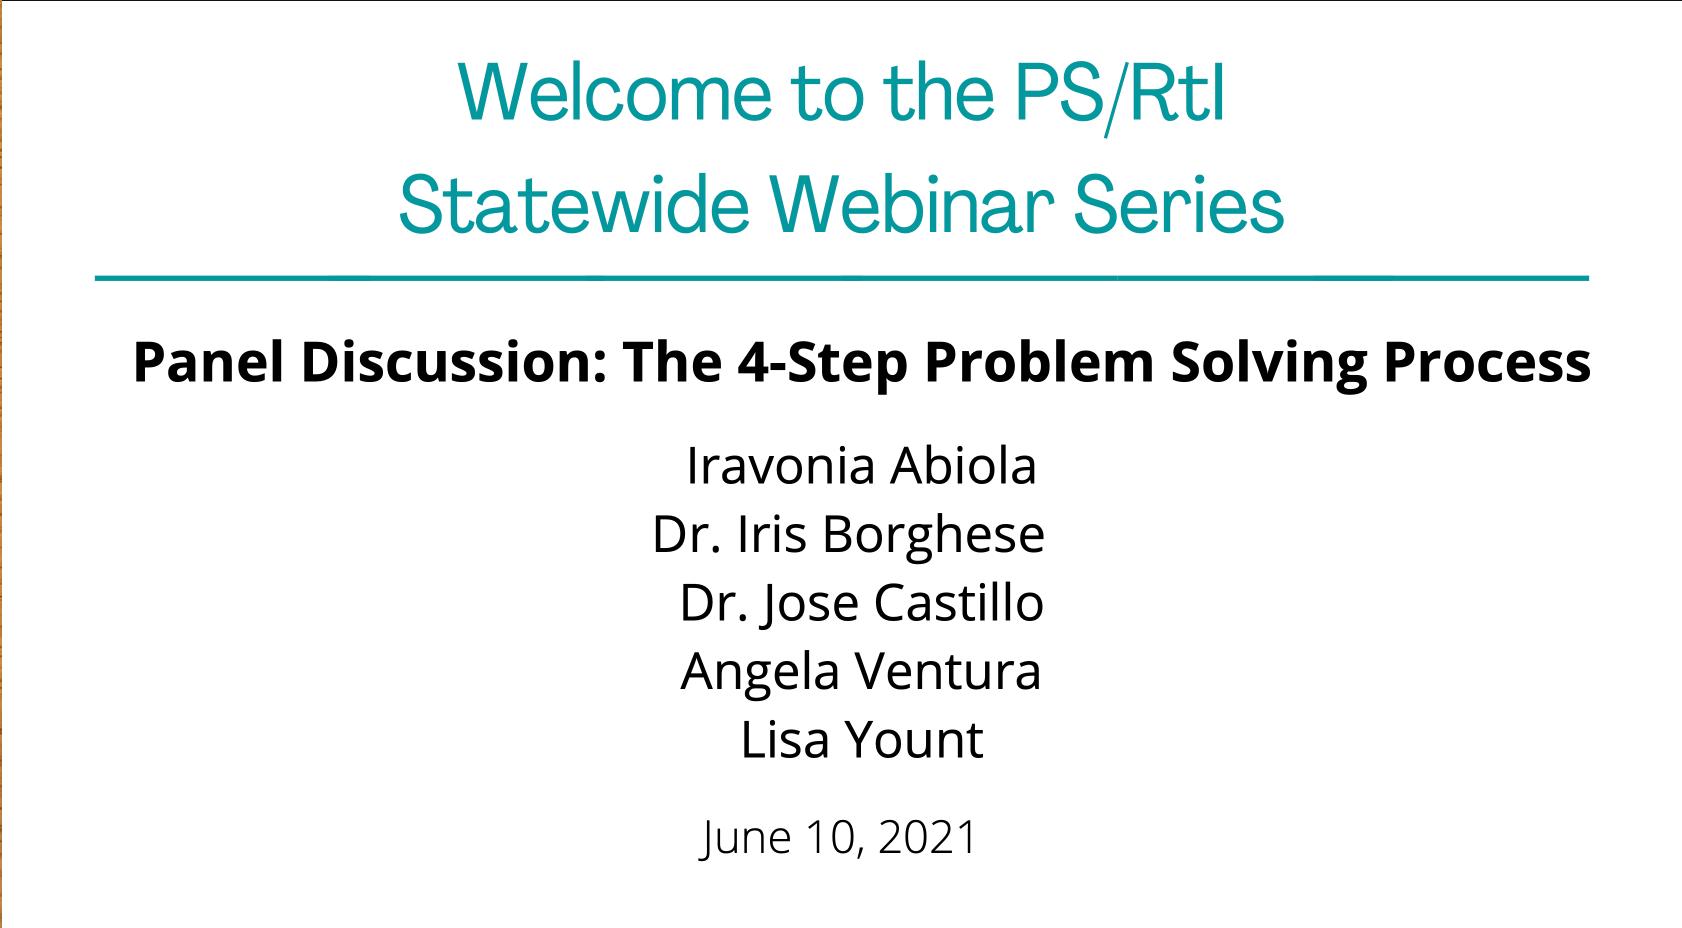 June 2021 Webinar: The 4-Step Problem Solving Process